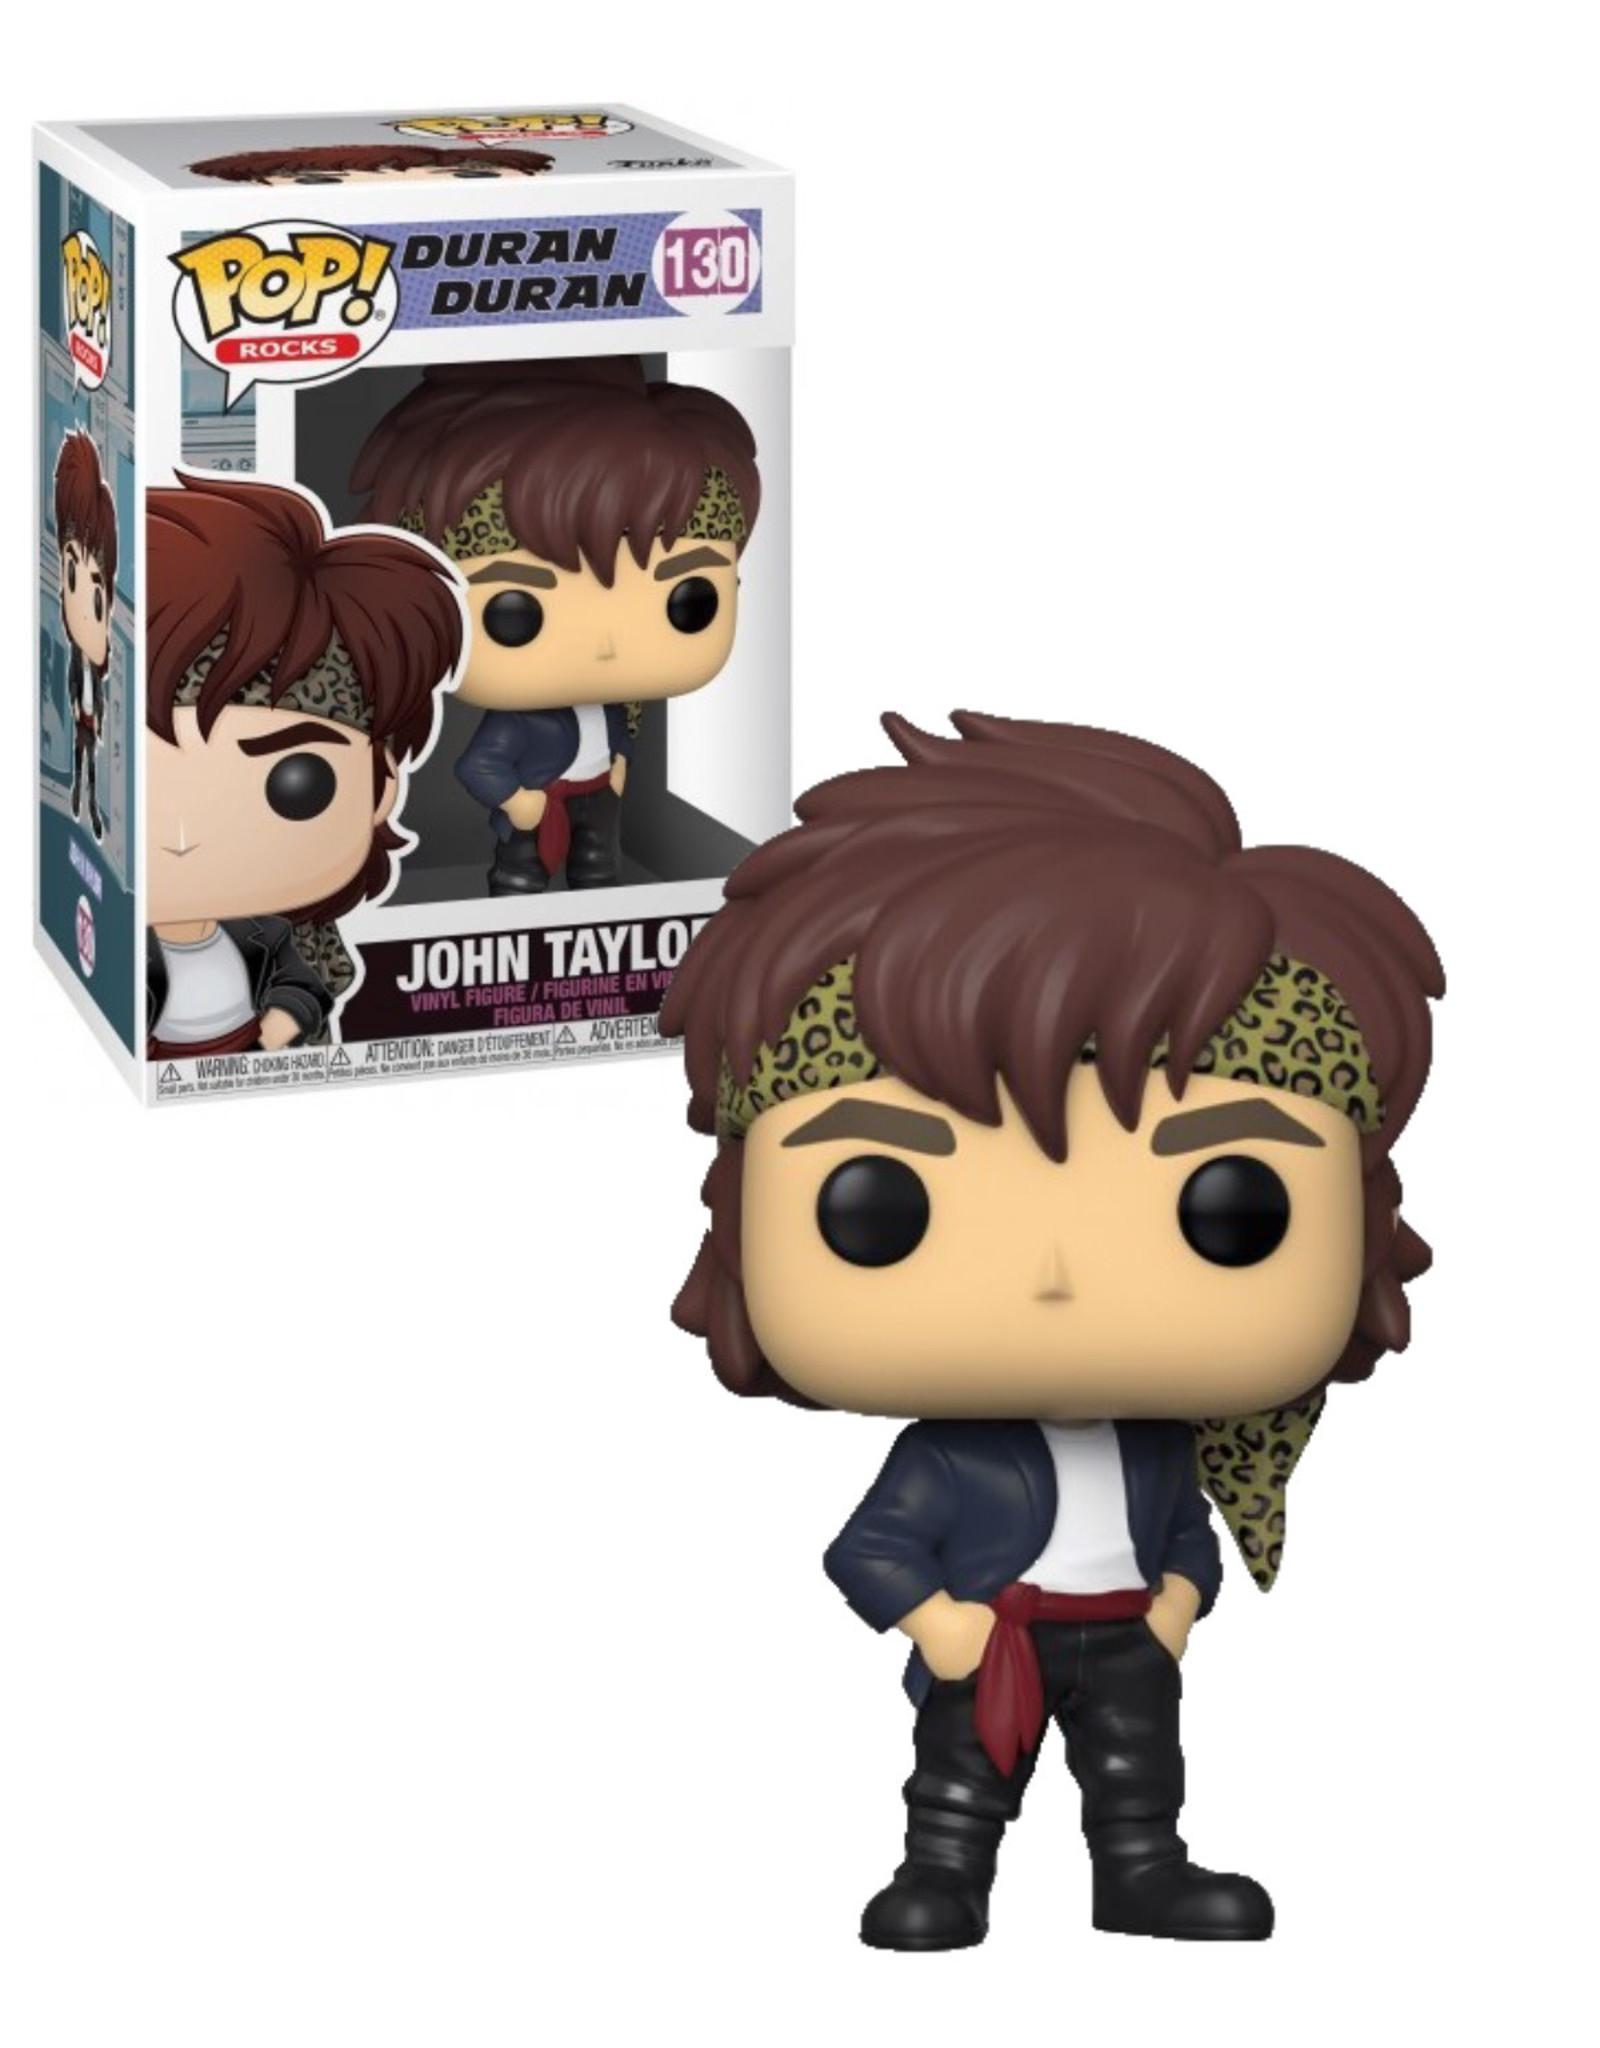 Duran Duran 130 ( Funko pop ) John Taylor